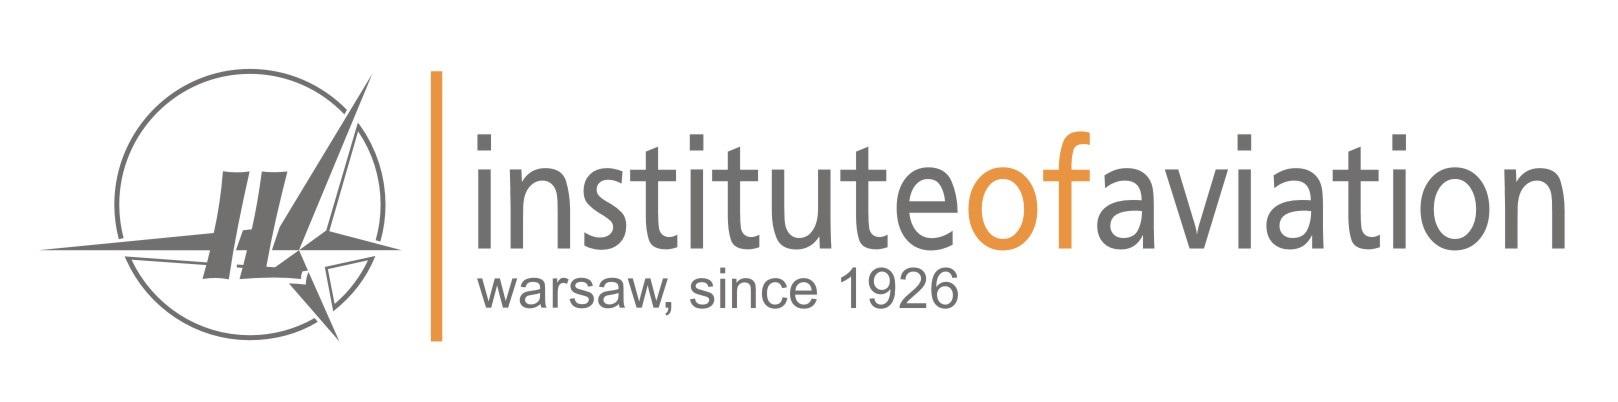 11_ilot_logo